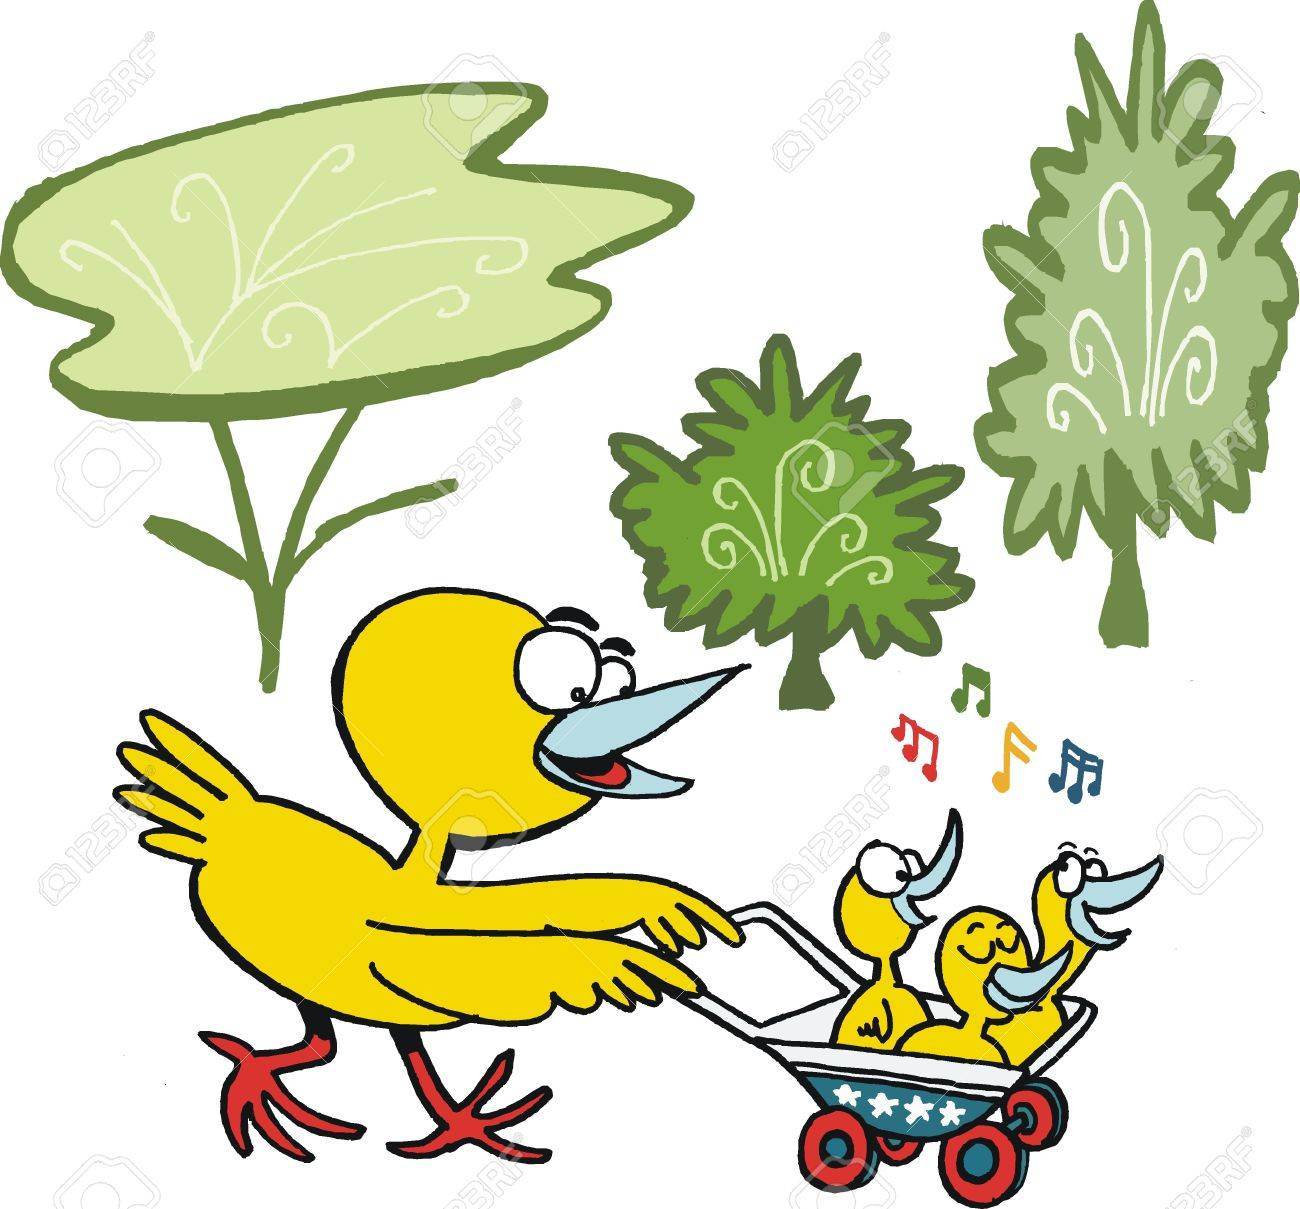 cartoon of yellow bird with chicks Stock Vector - 15324807